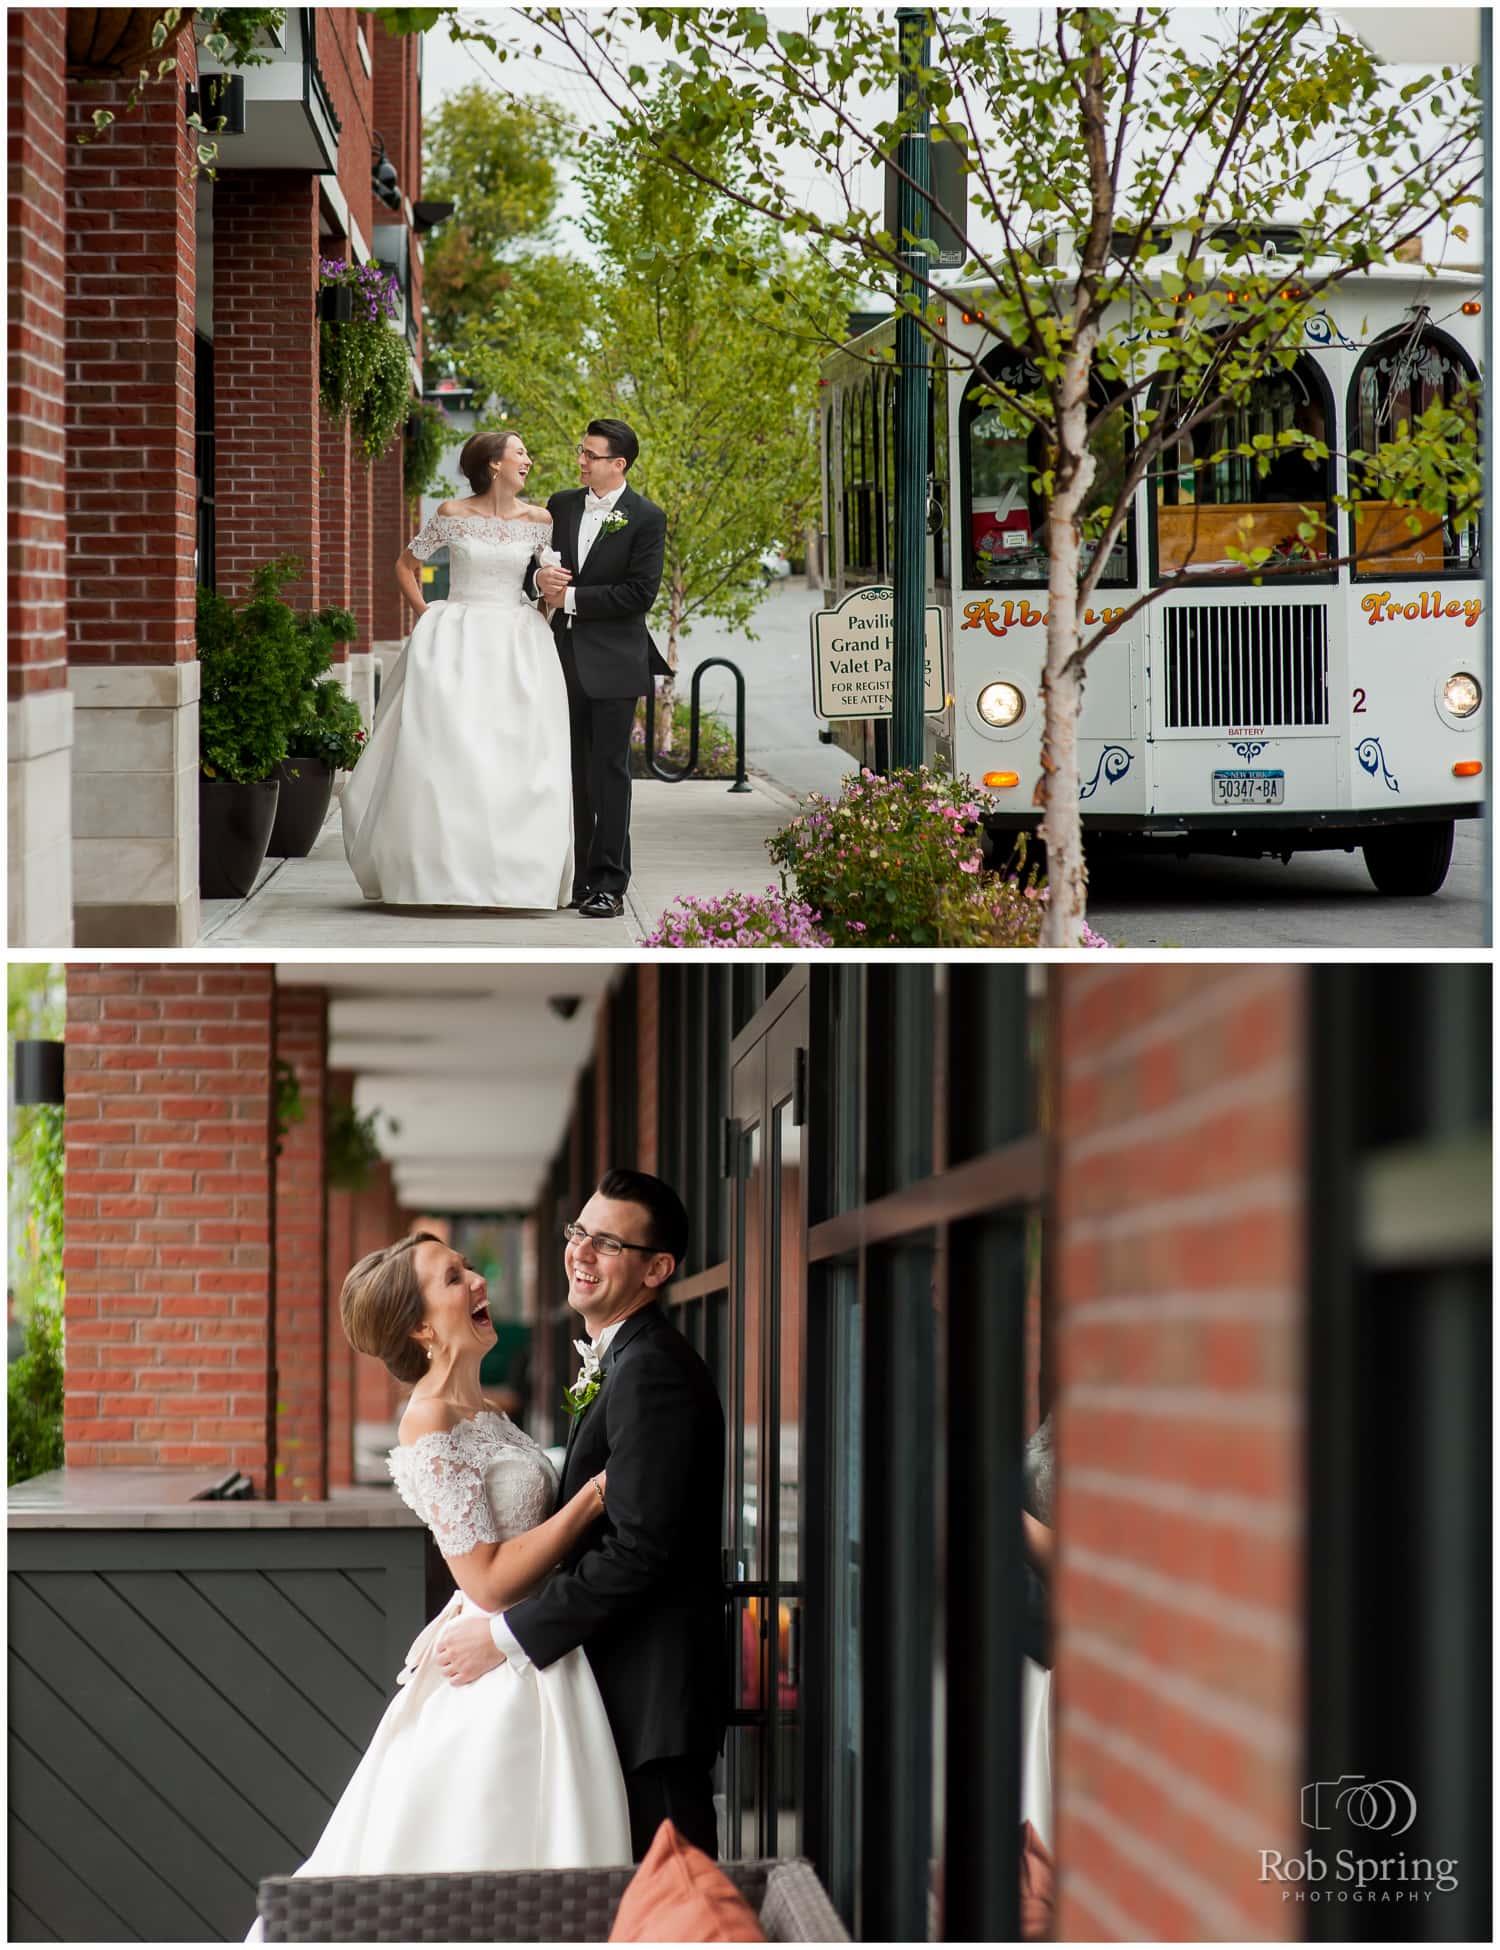 wedding photos with albany trolley, Pavilion Grand Hotel, Saratoga Springs, NY wedding photographer | Canfield Casino wedding